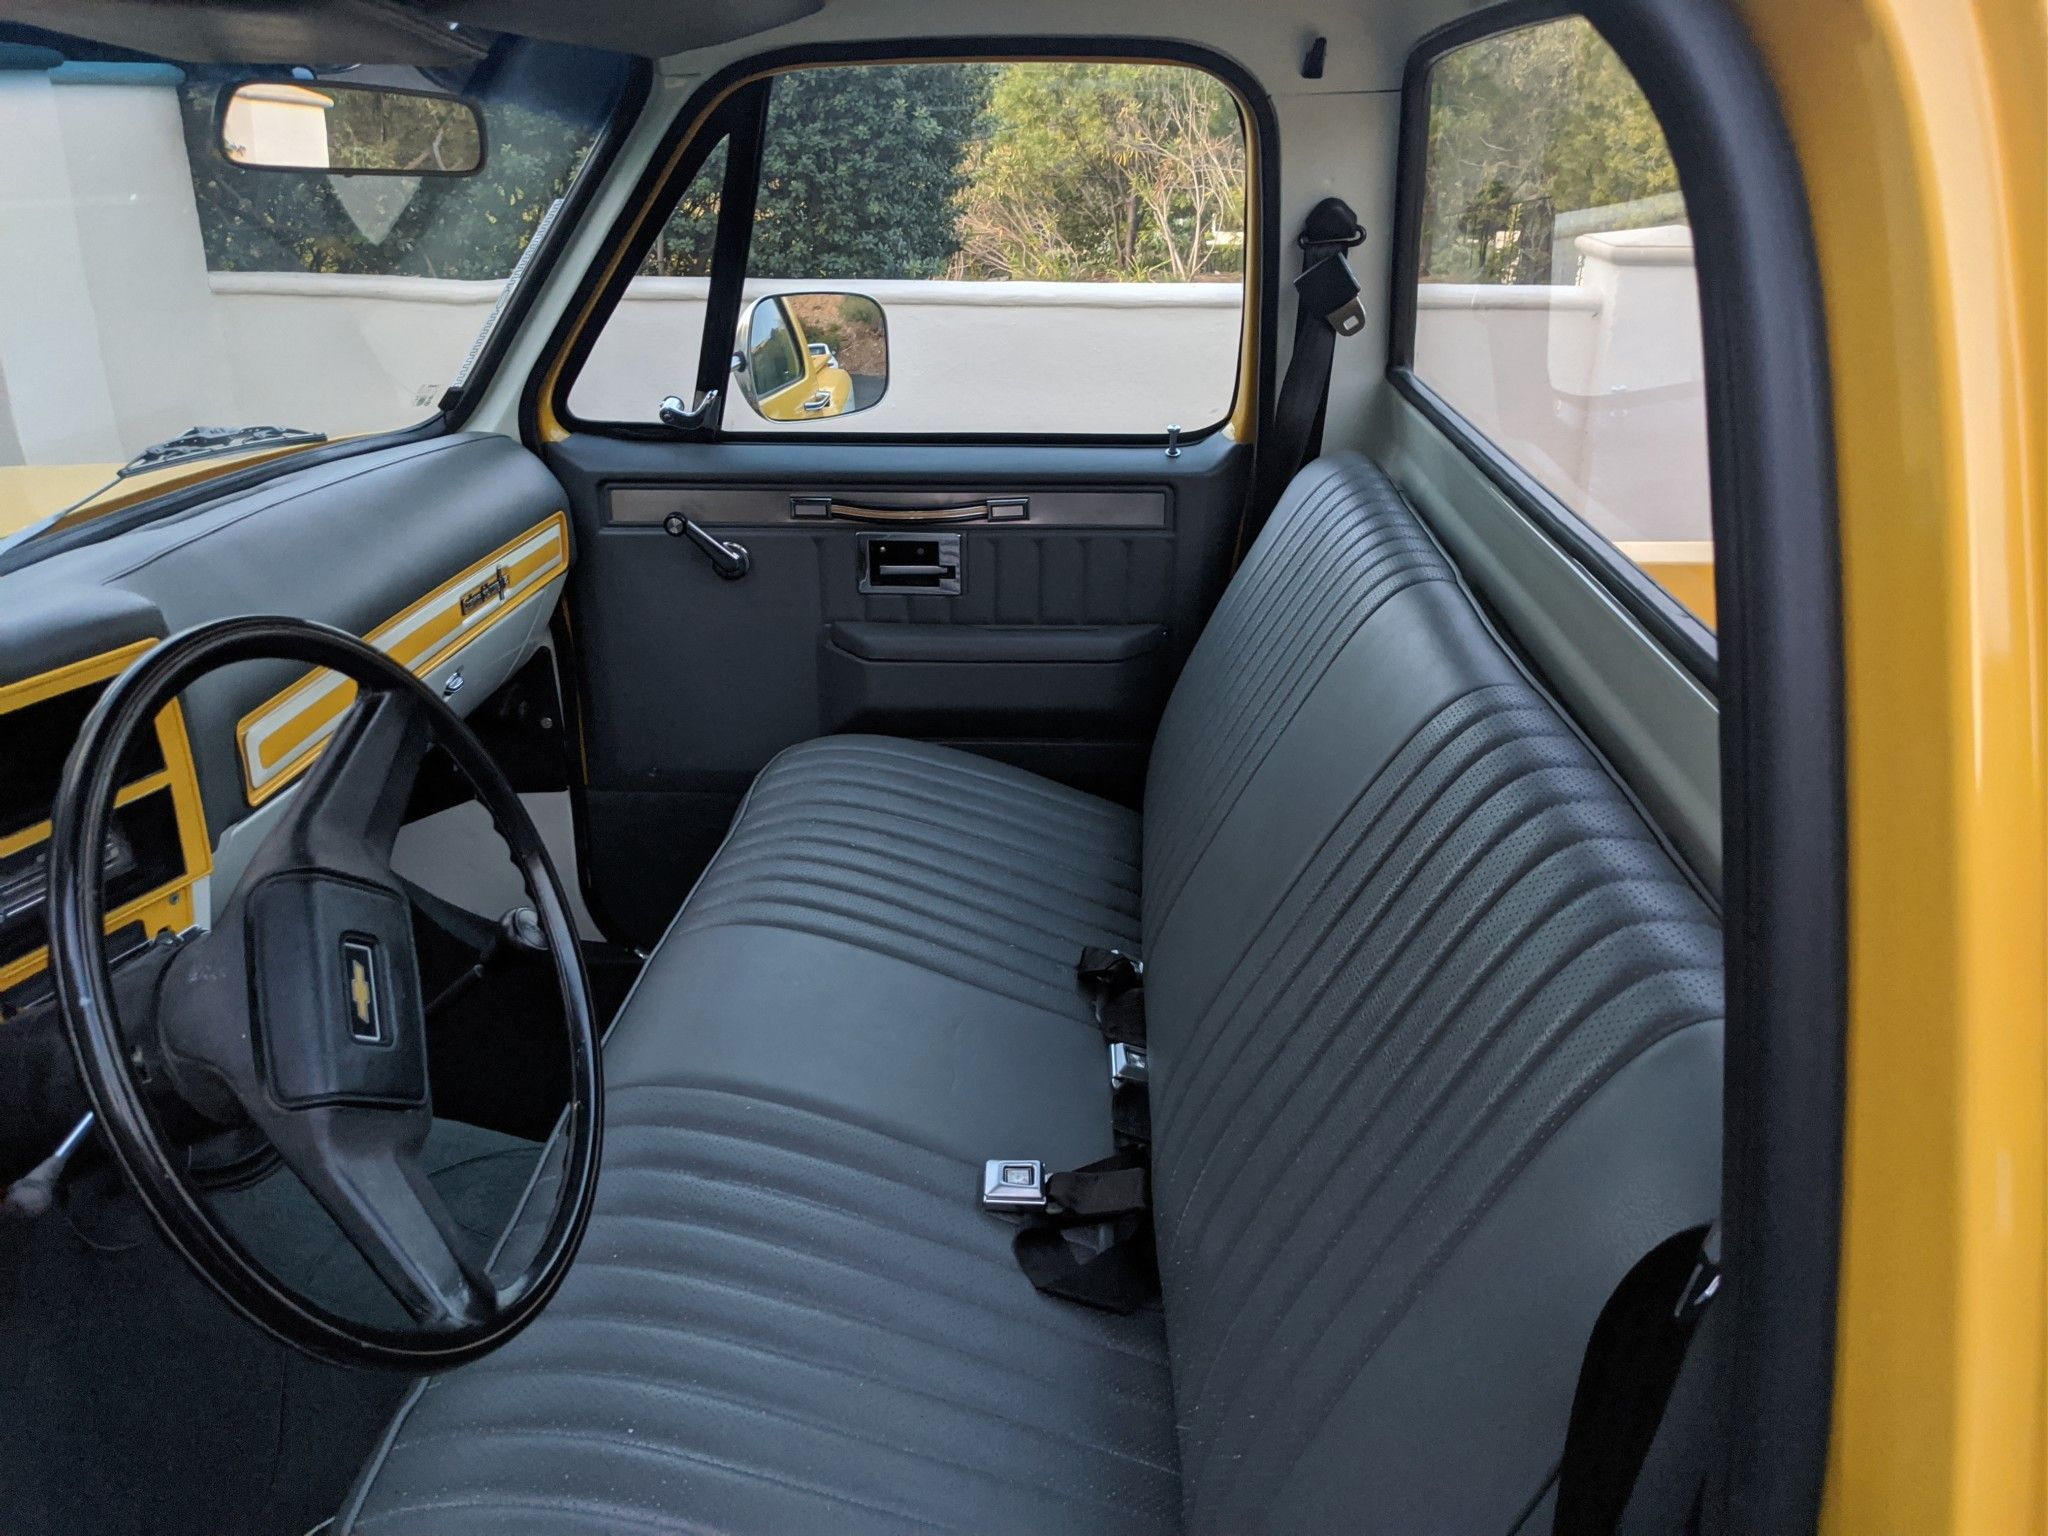 1974 Chevrolet C10 Stepside Chevrolet Classic Cars Trucks Chevy C10